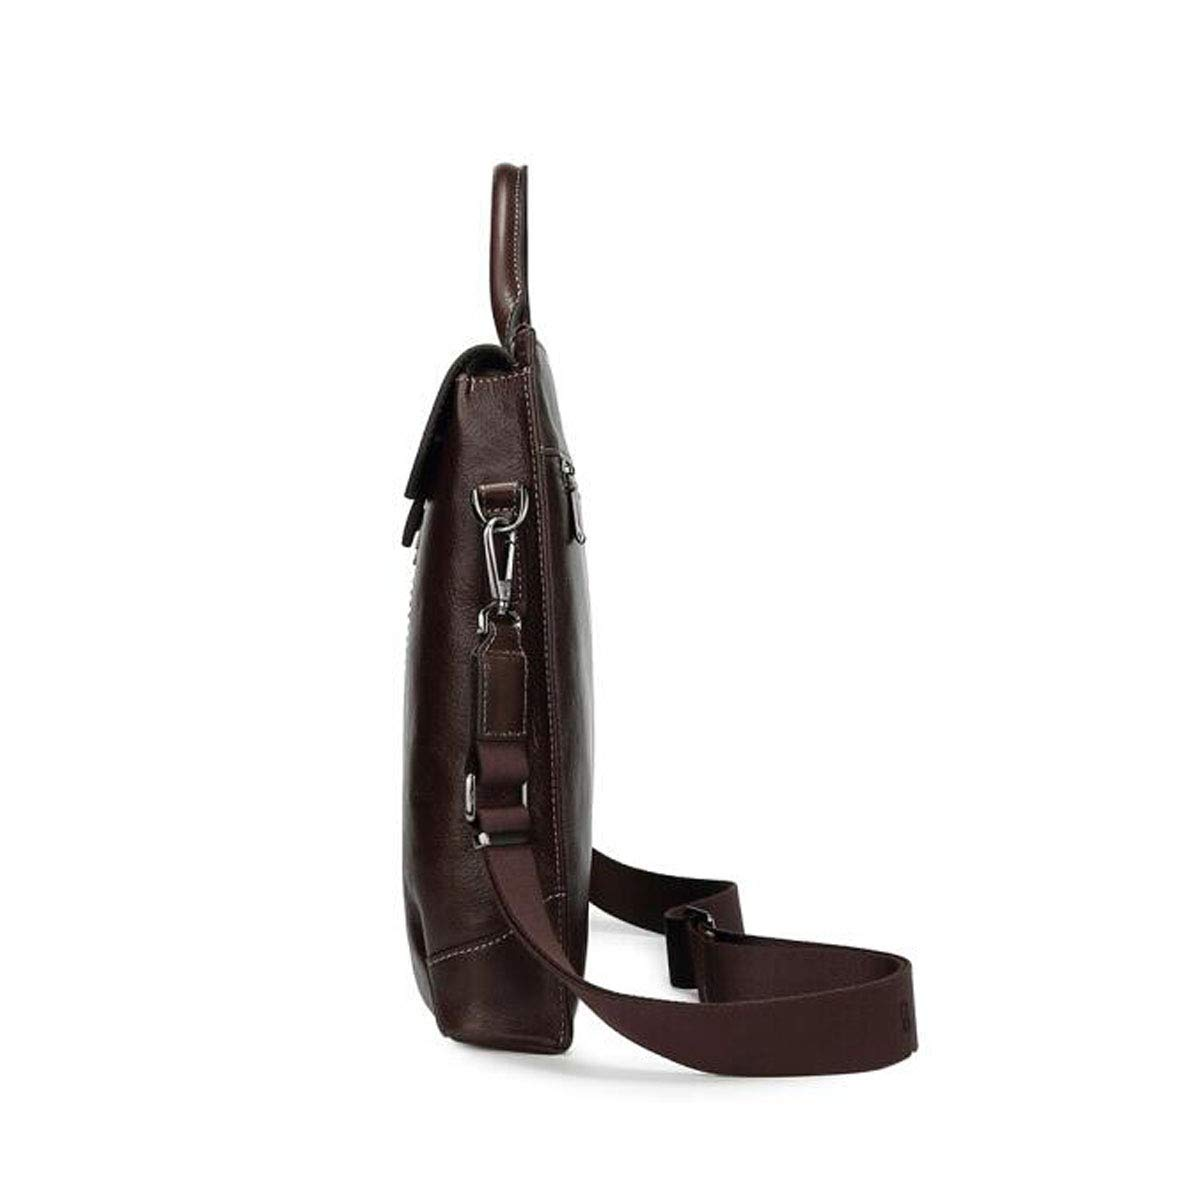 Large Capacity Computer Bag 8haowenju Briefcase Business Casual Leather Handbag Mens Trend Retro Shoulder Bag Color : Brown Dark Brown Size: 29.56.533cm